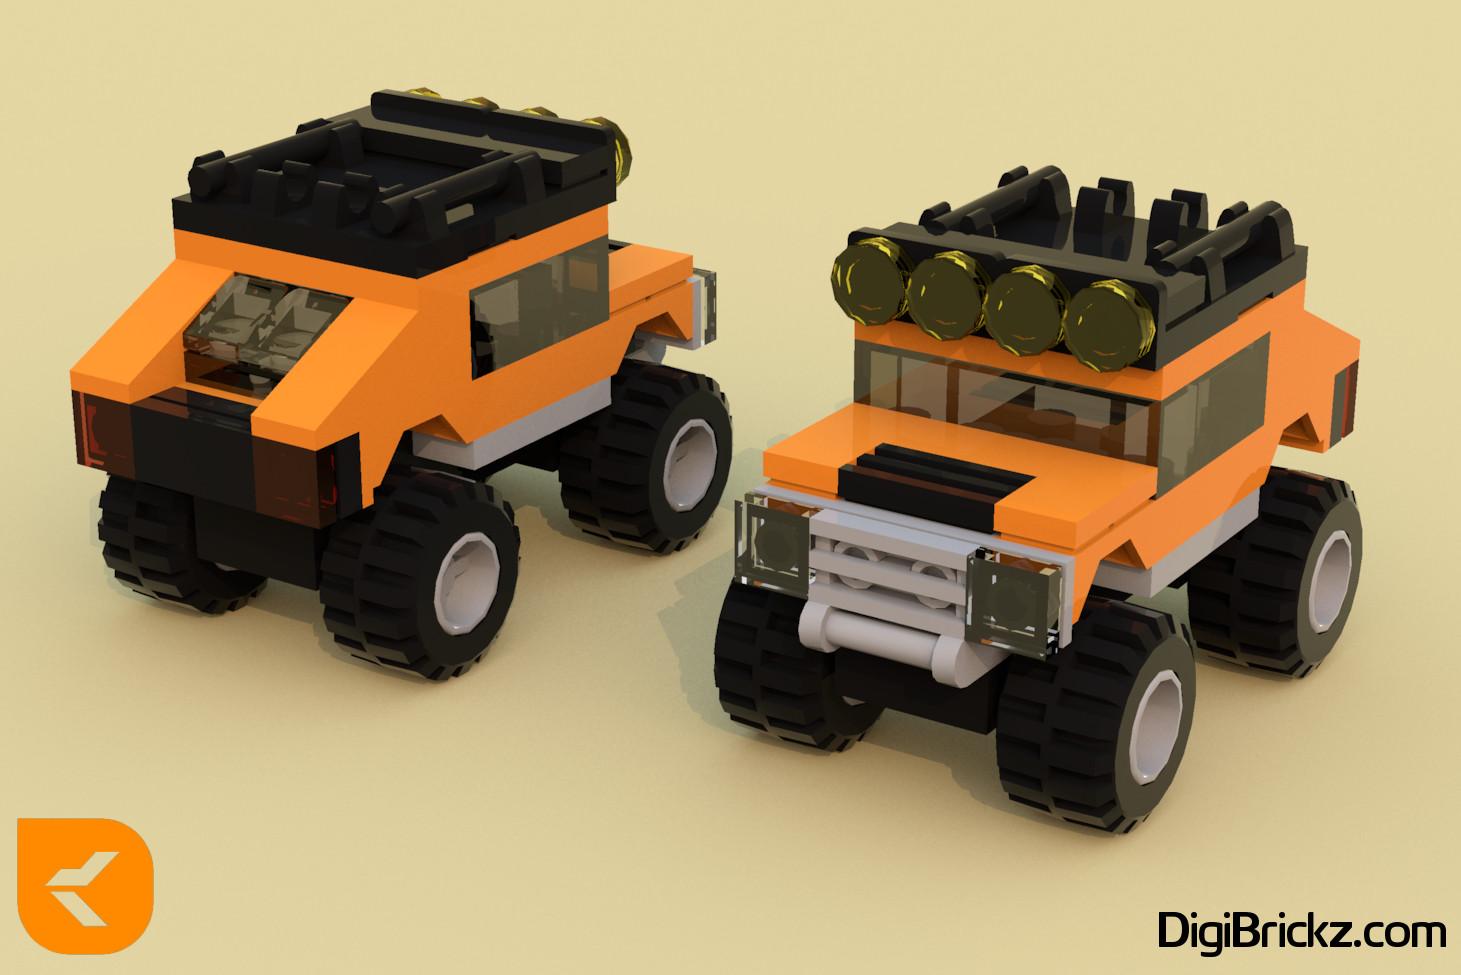 LEGO Heavily Modified 30283 - Hummer® by Kamal Muftie Yafi (KamalMYafi/Kamteey) | DigiBrickz.com